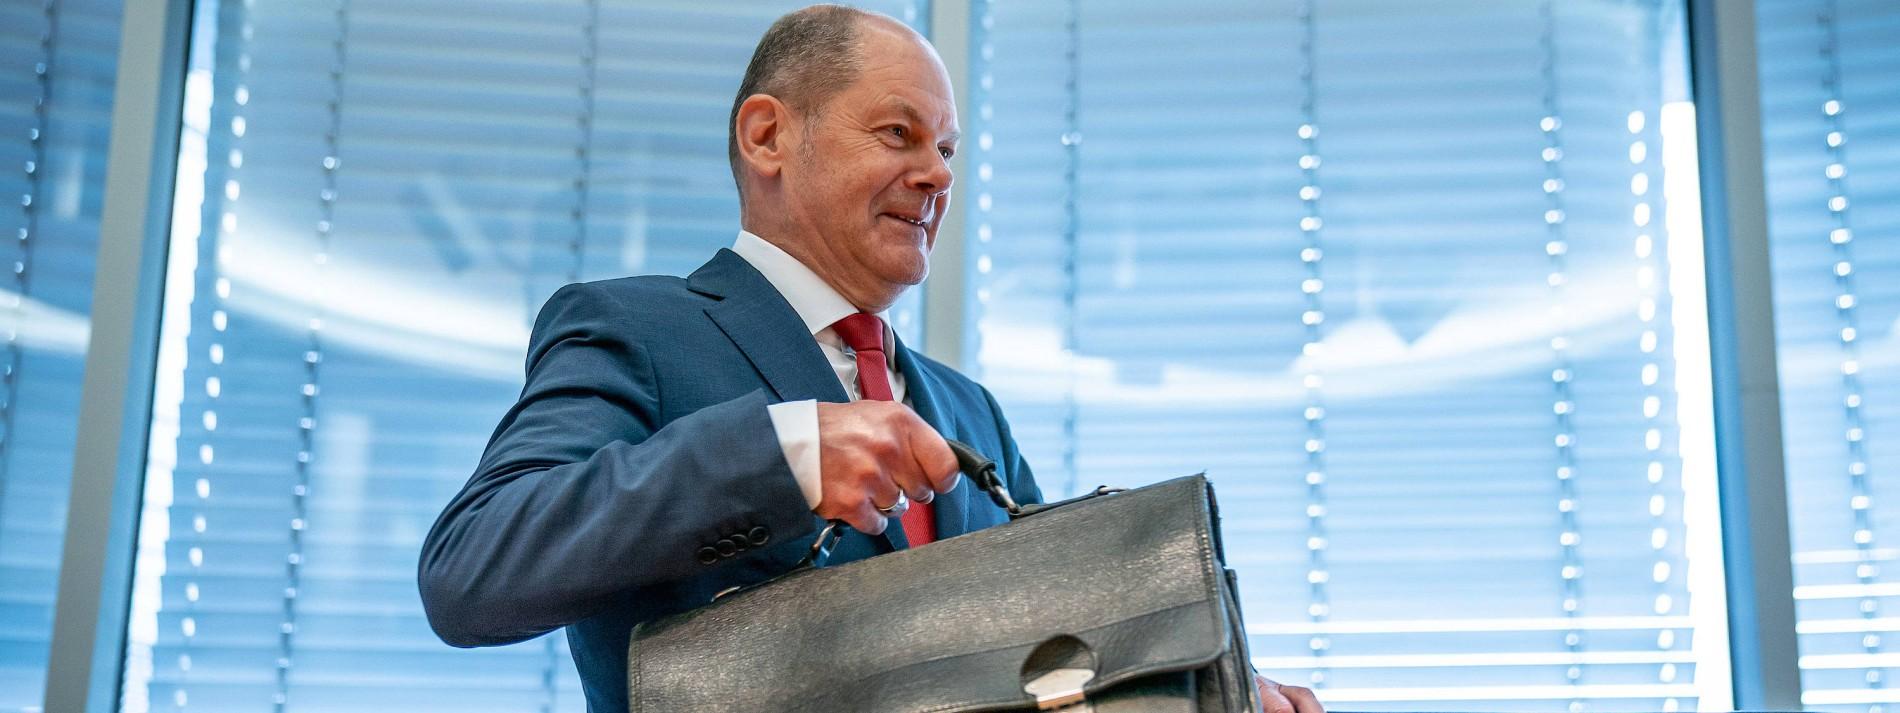 Hat Scholz den Wirecard-Ausschuss behindert?